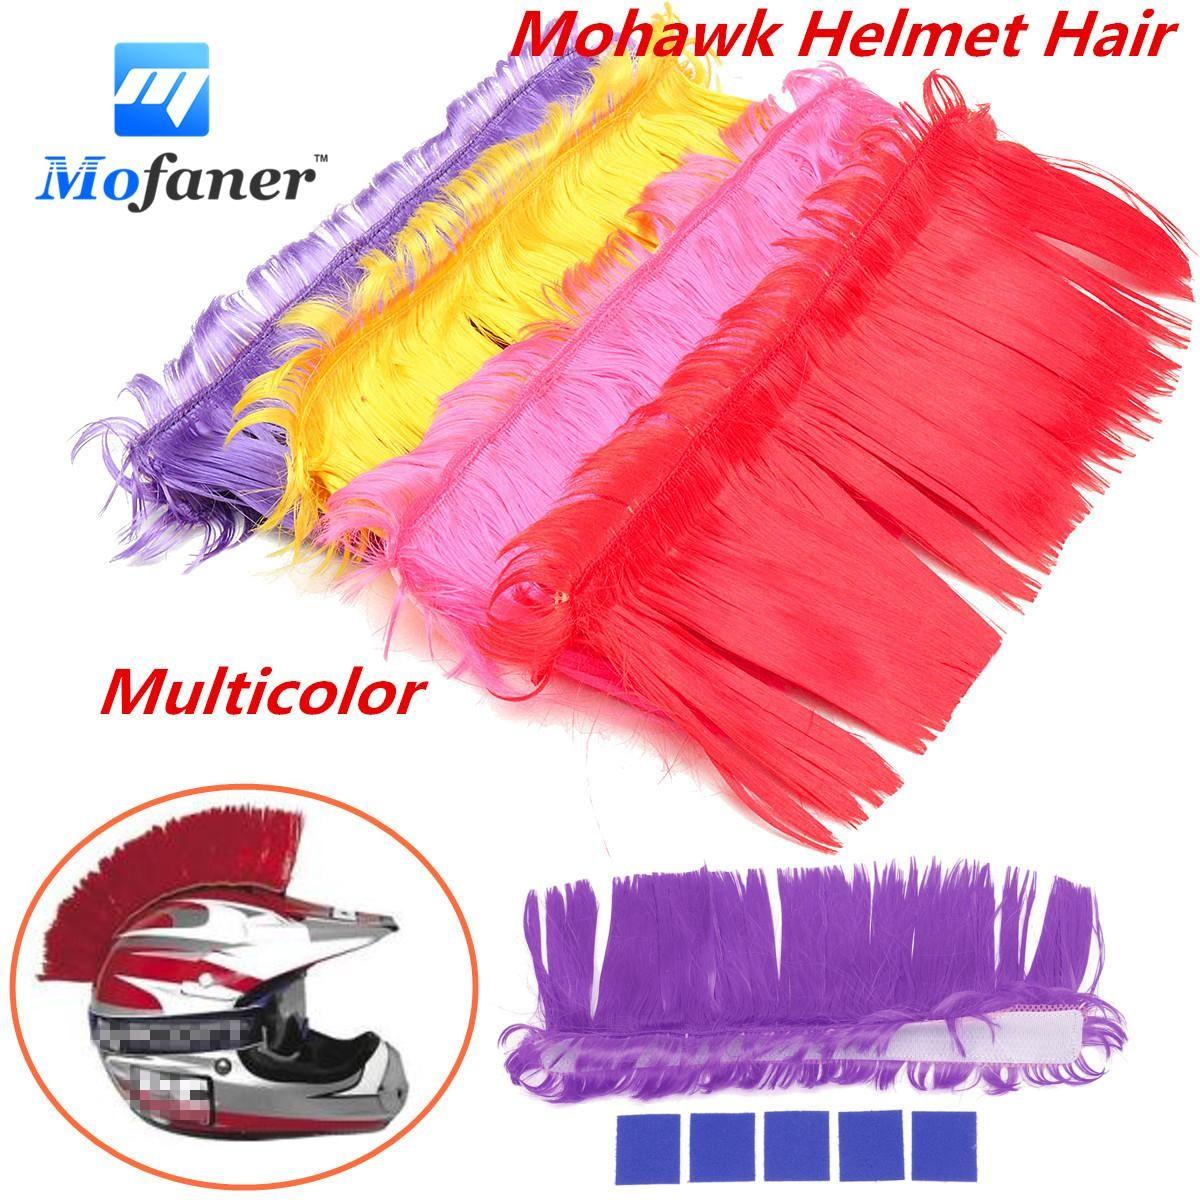 Mofaner Motorbike Helmet Mohawk Hair Punk Hair For Motorcycle Helmets Ski Snowboard Paintball Race